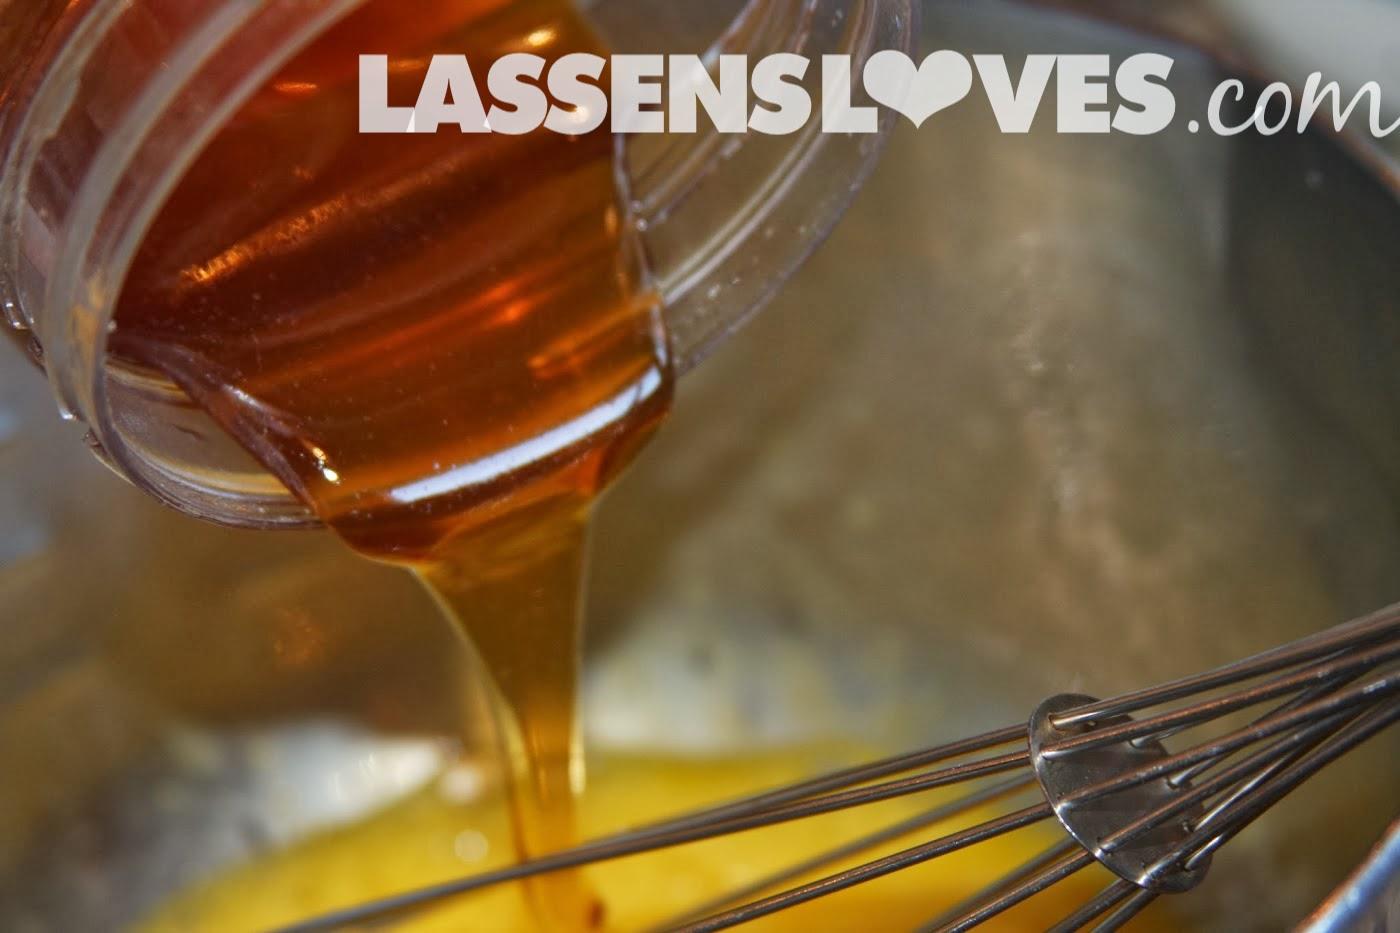 lassensloves.com, Lassen's, Lassens, Danish+Pancakes